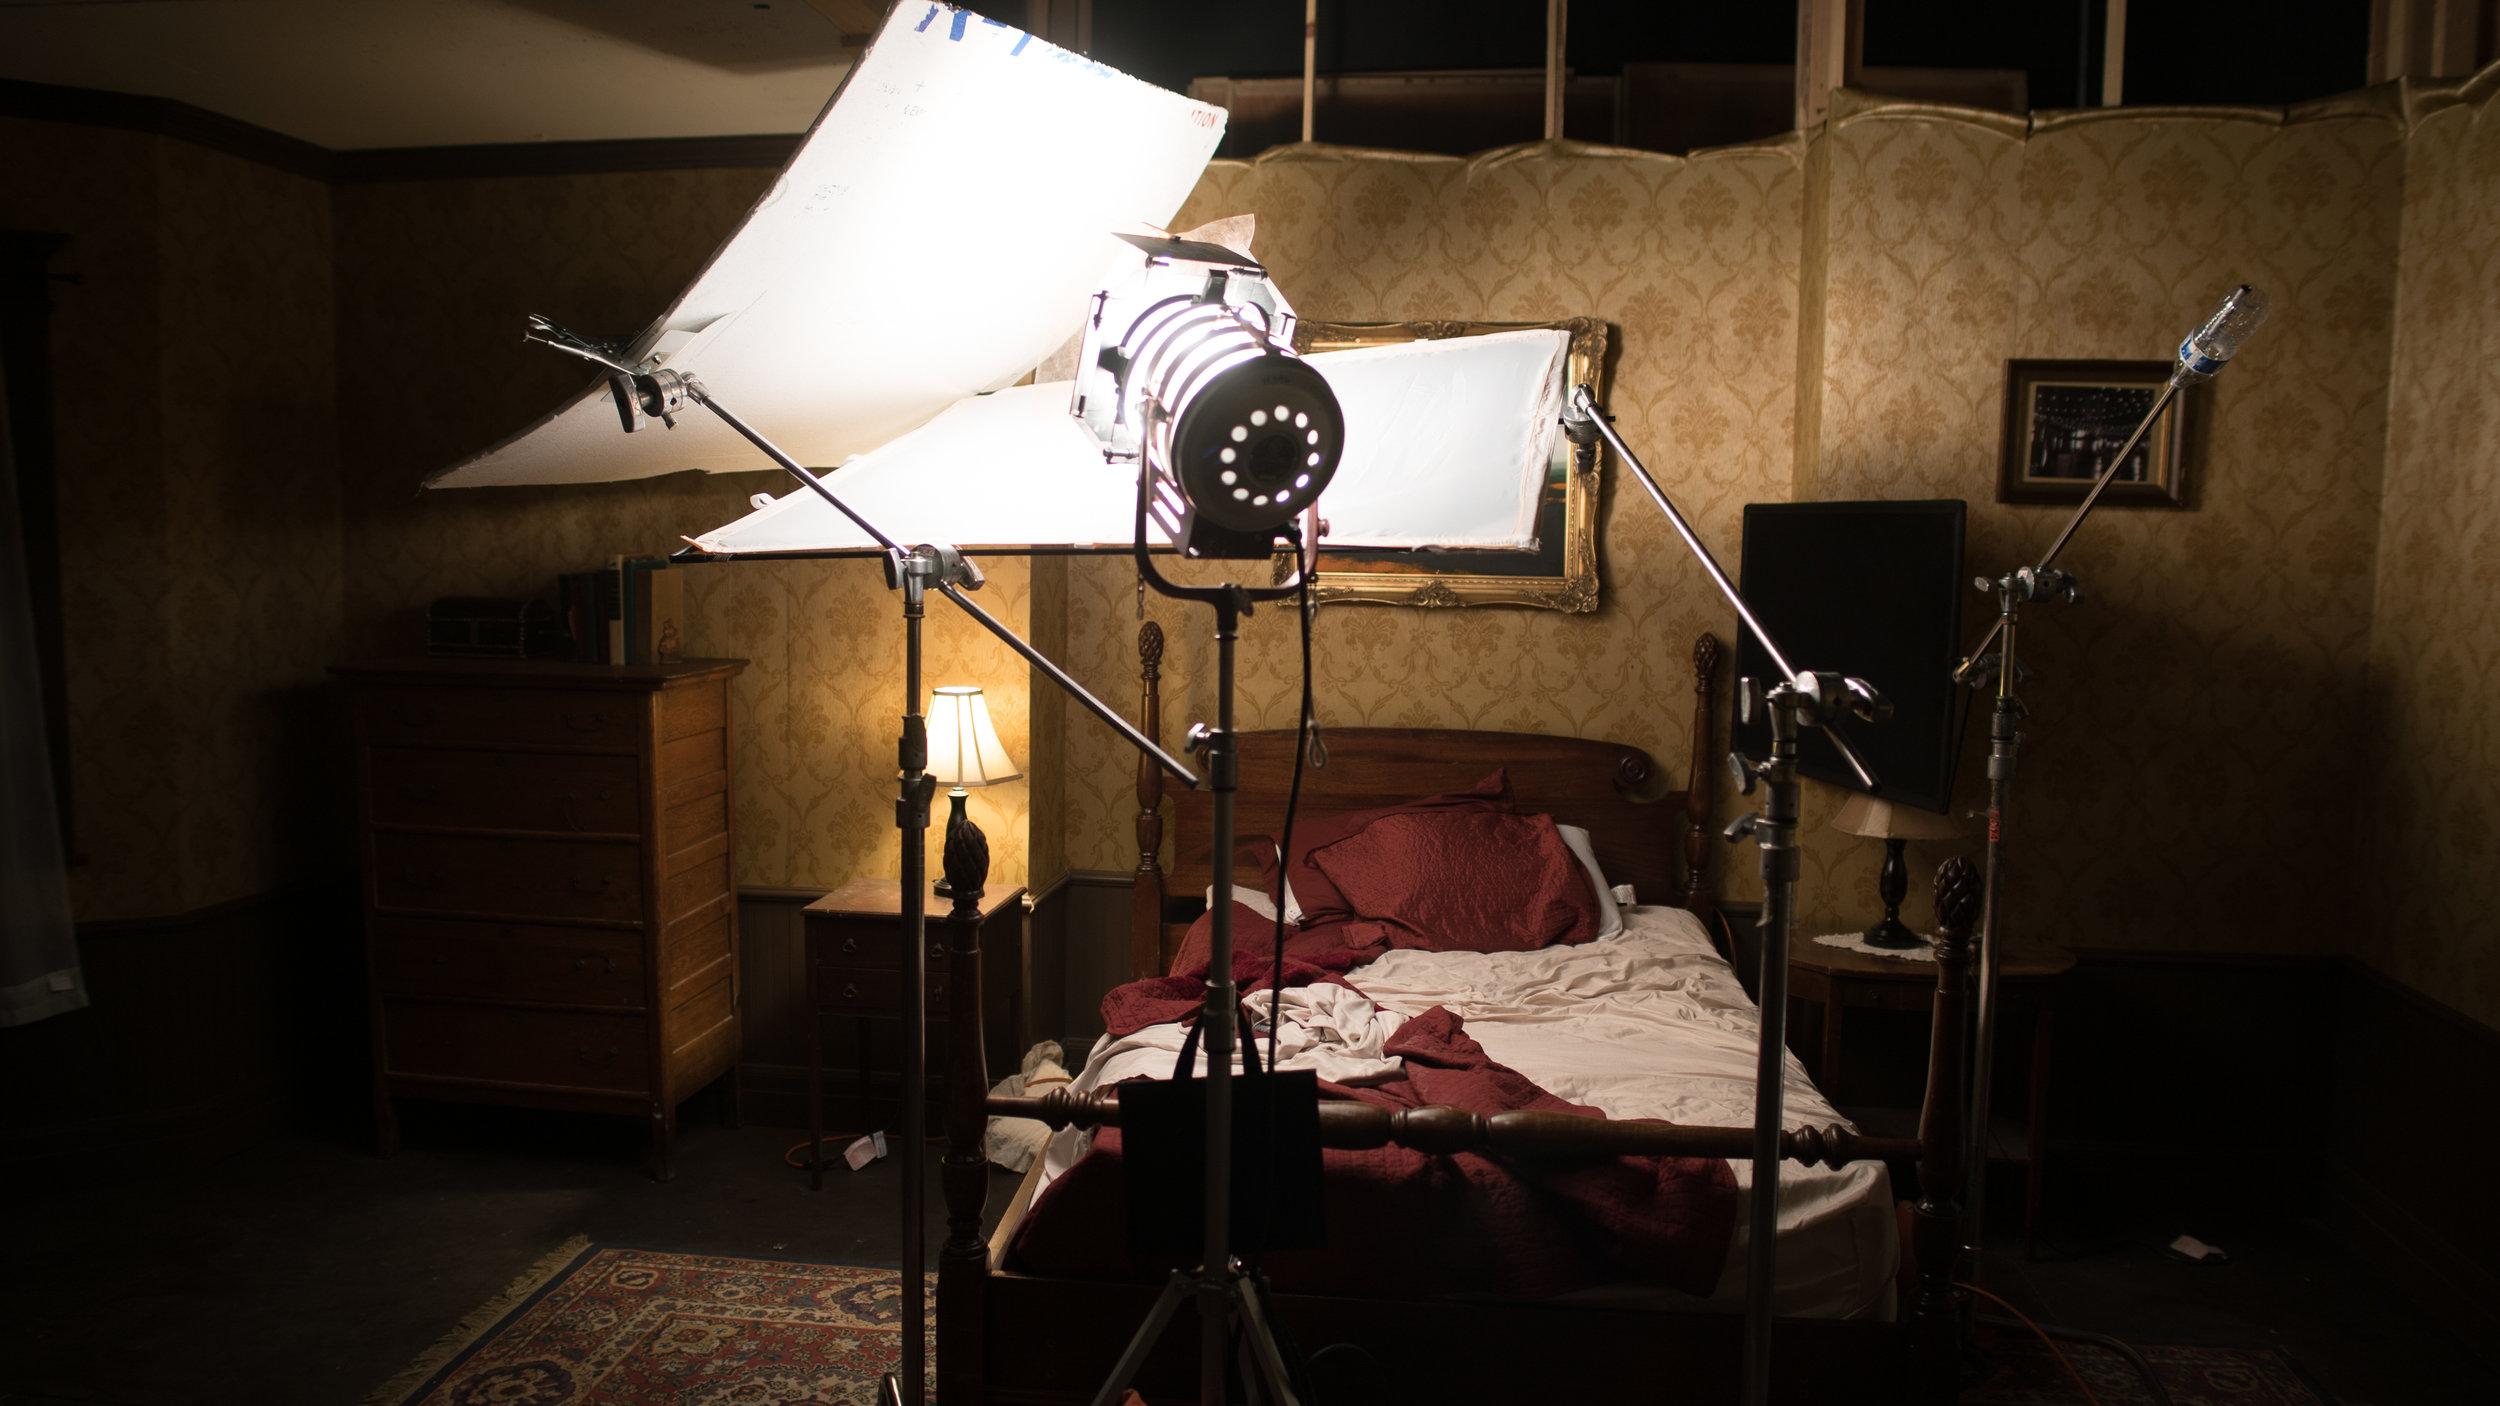 Bed Pre-Light.jpg